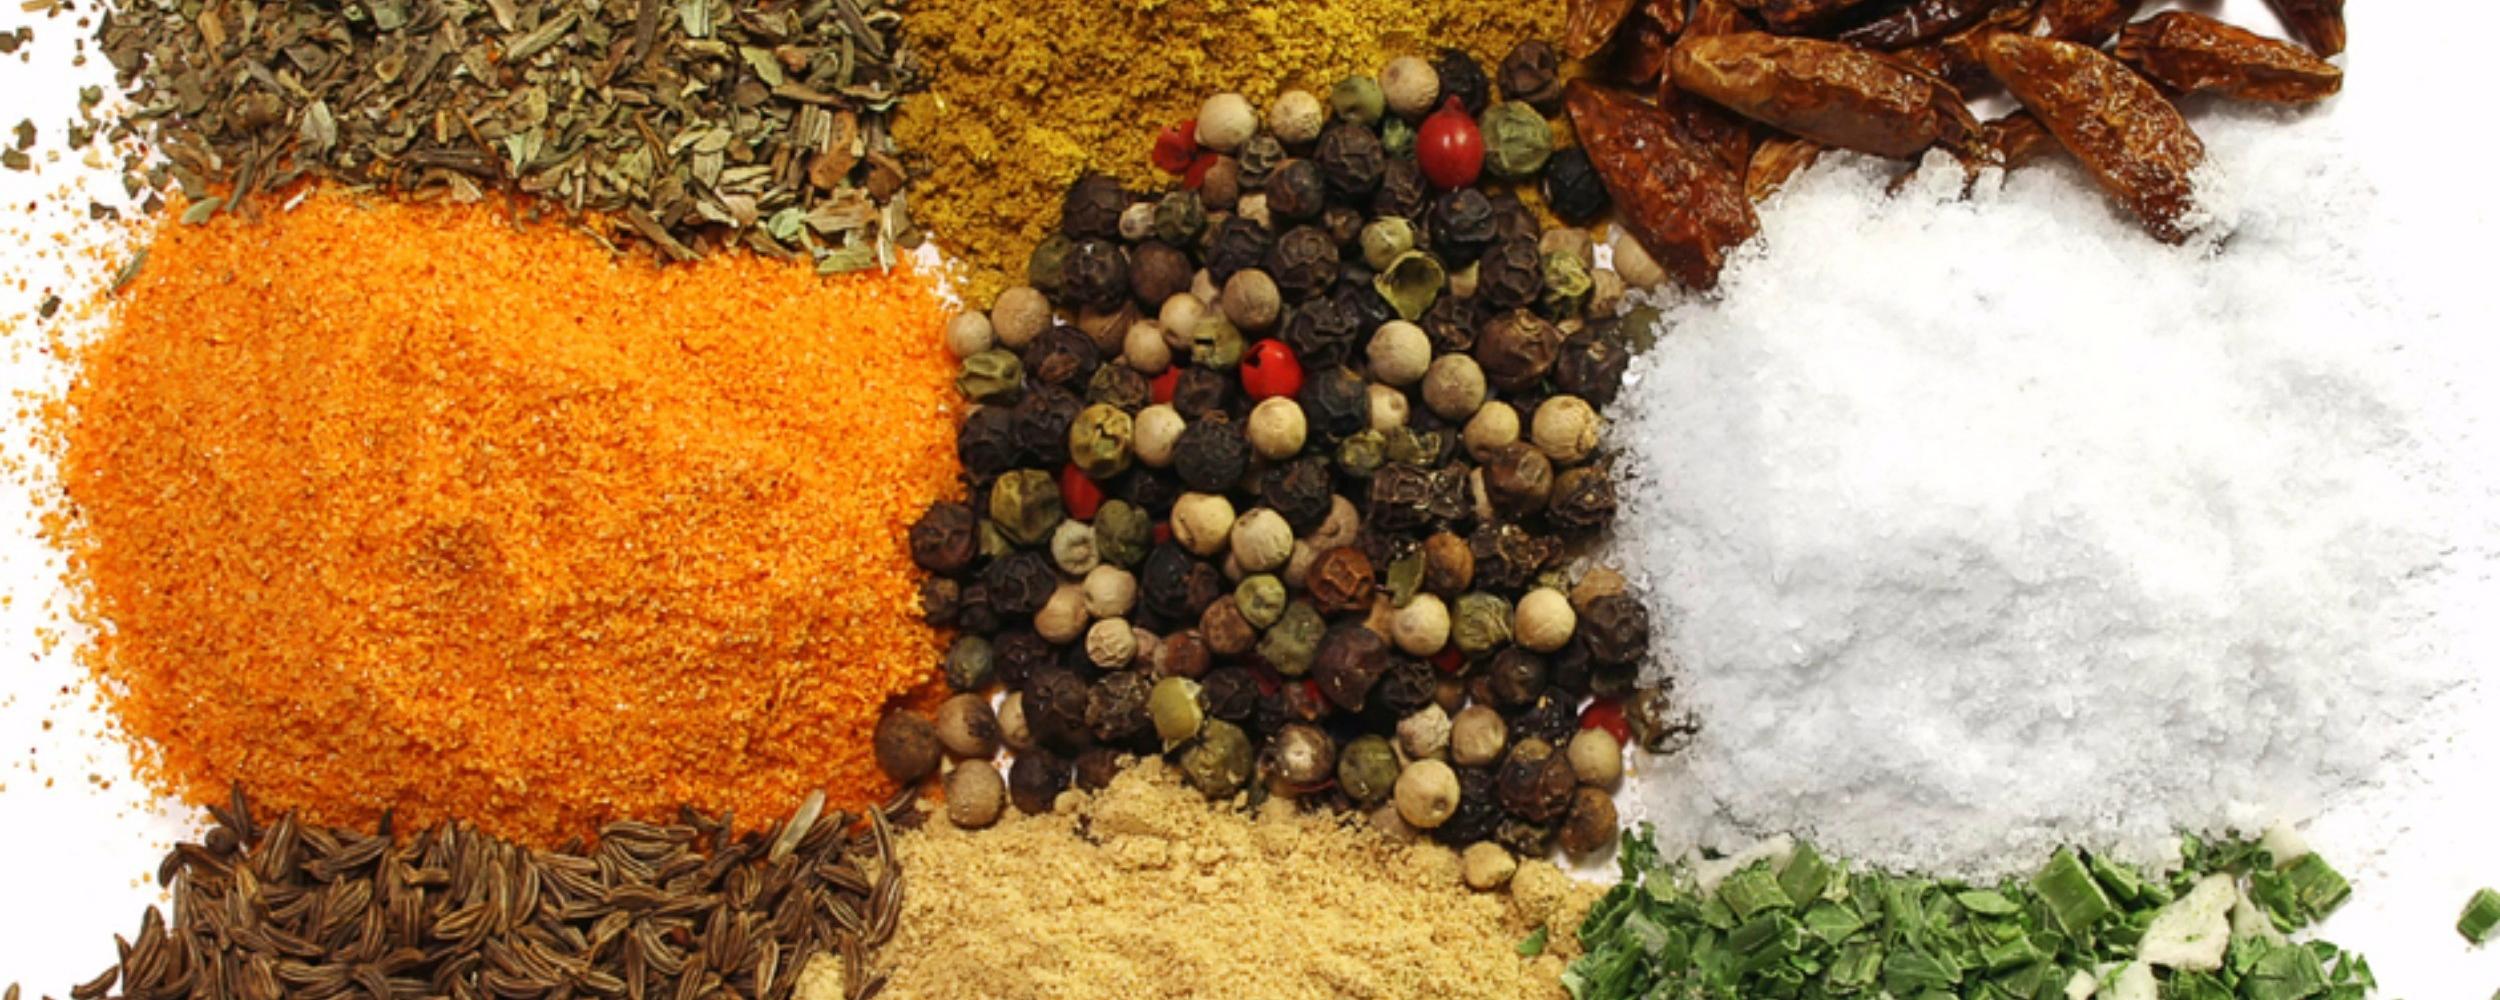 Market Spice Slider